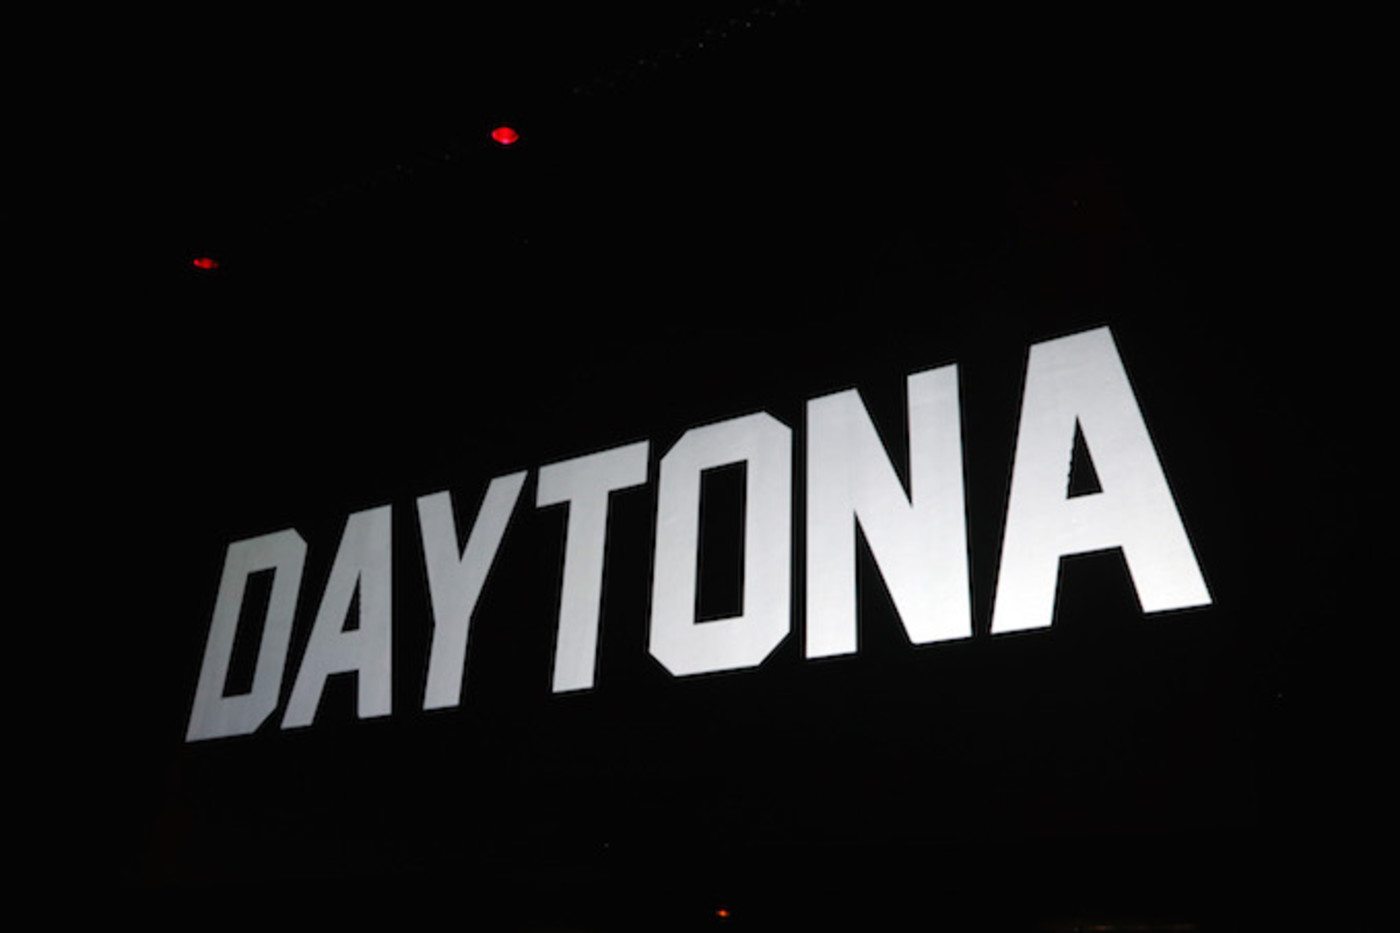 Daytona party sign